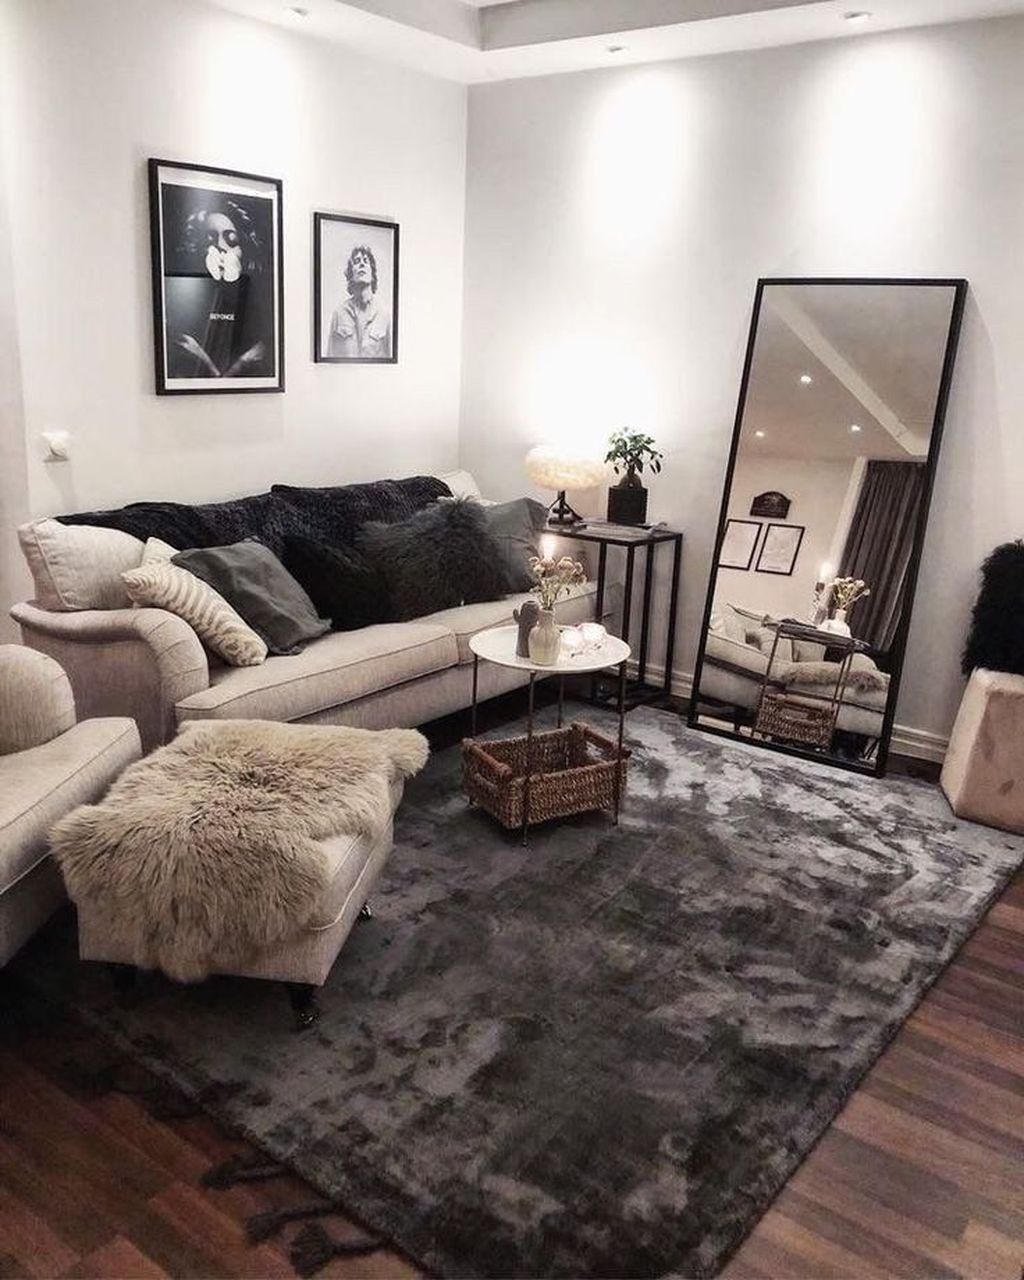 35 Unique Small Apartment Decorating Ideas On A Budget Small Living Room Decor Farm House Living Room Apartment Living Room